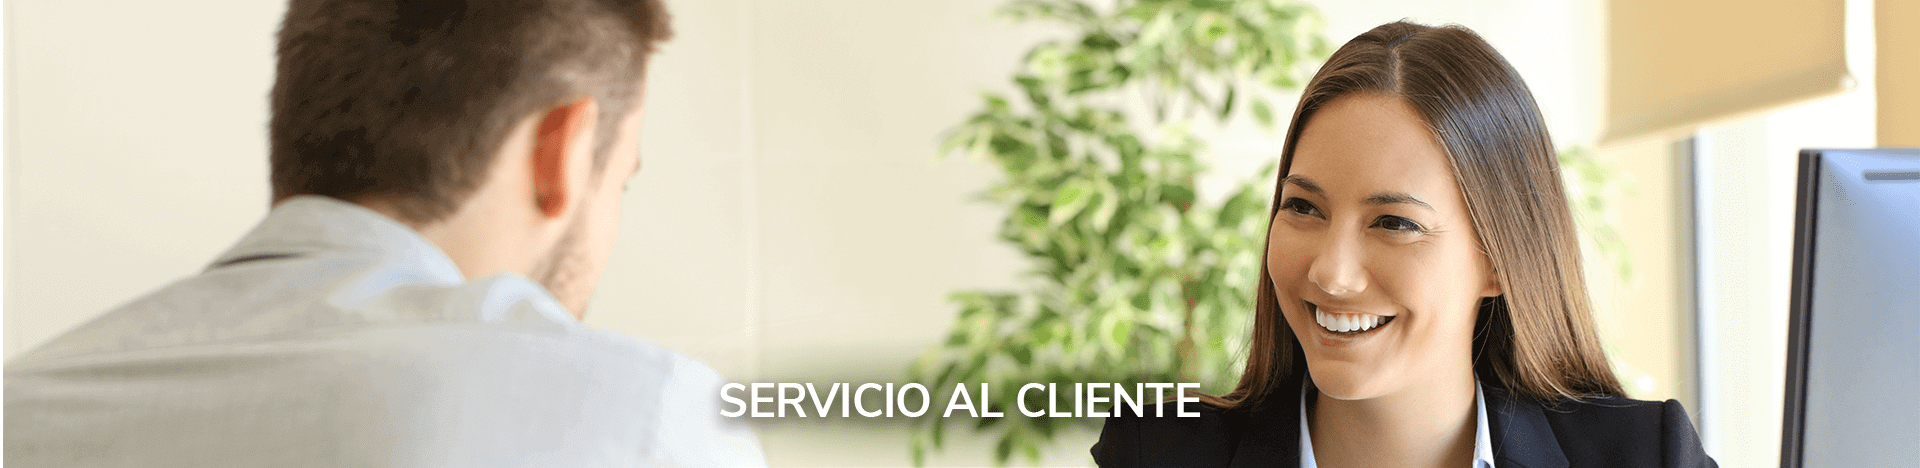 banner servicio cliente actual inmobiliaria